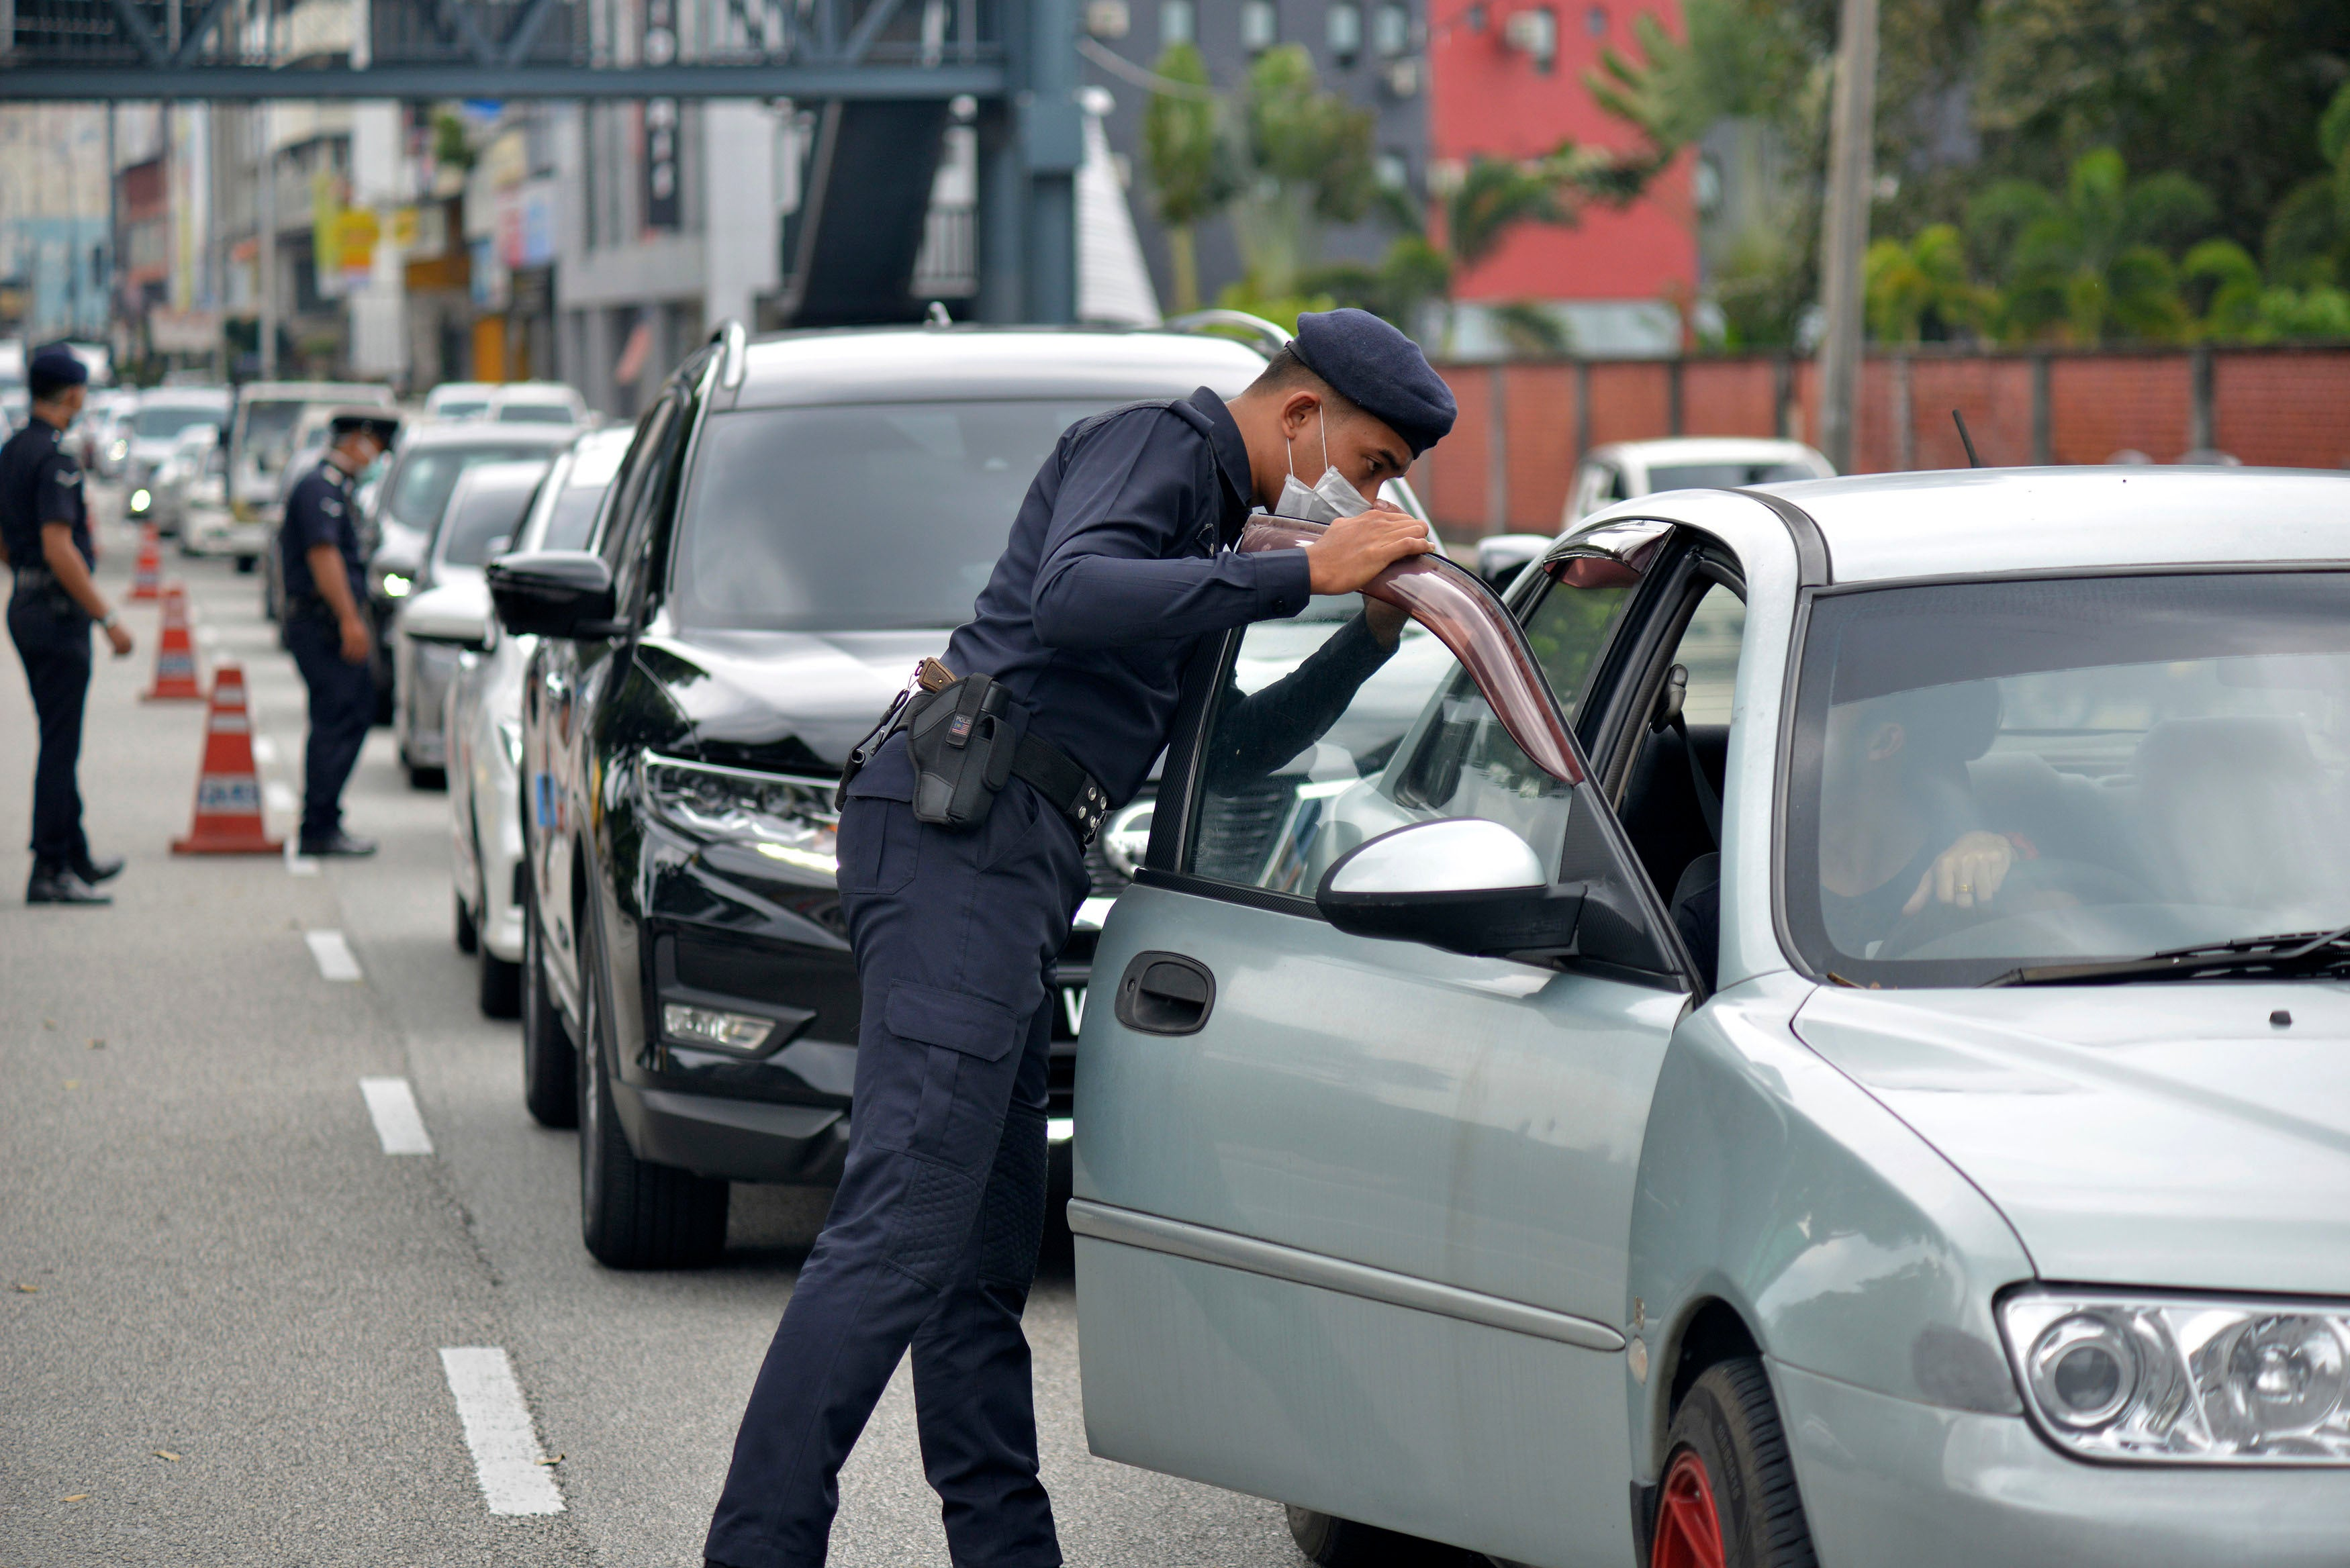 malaysia lockdown rakyat long suffering play favourites